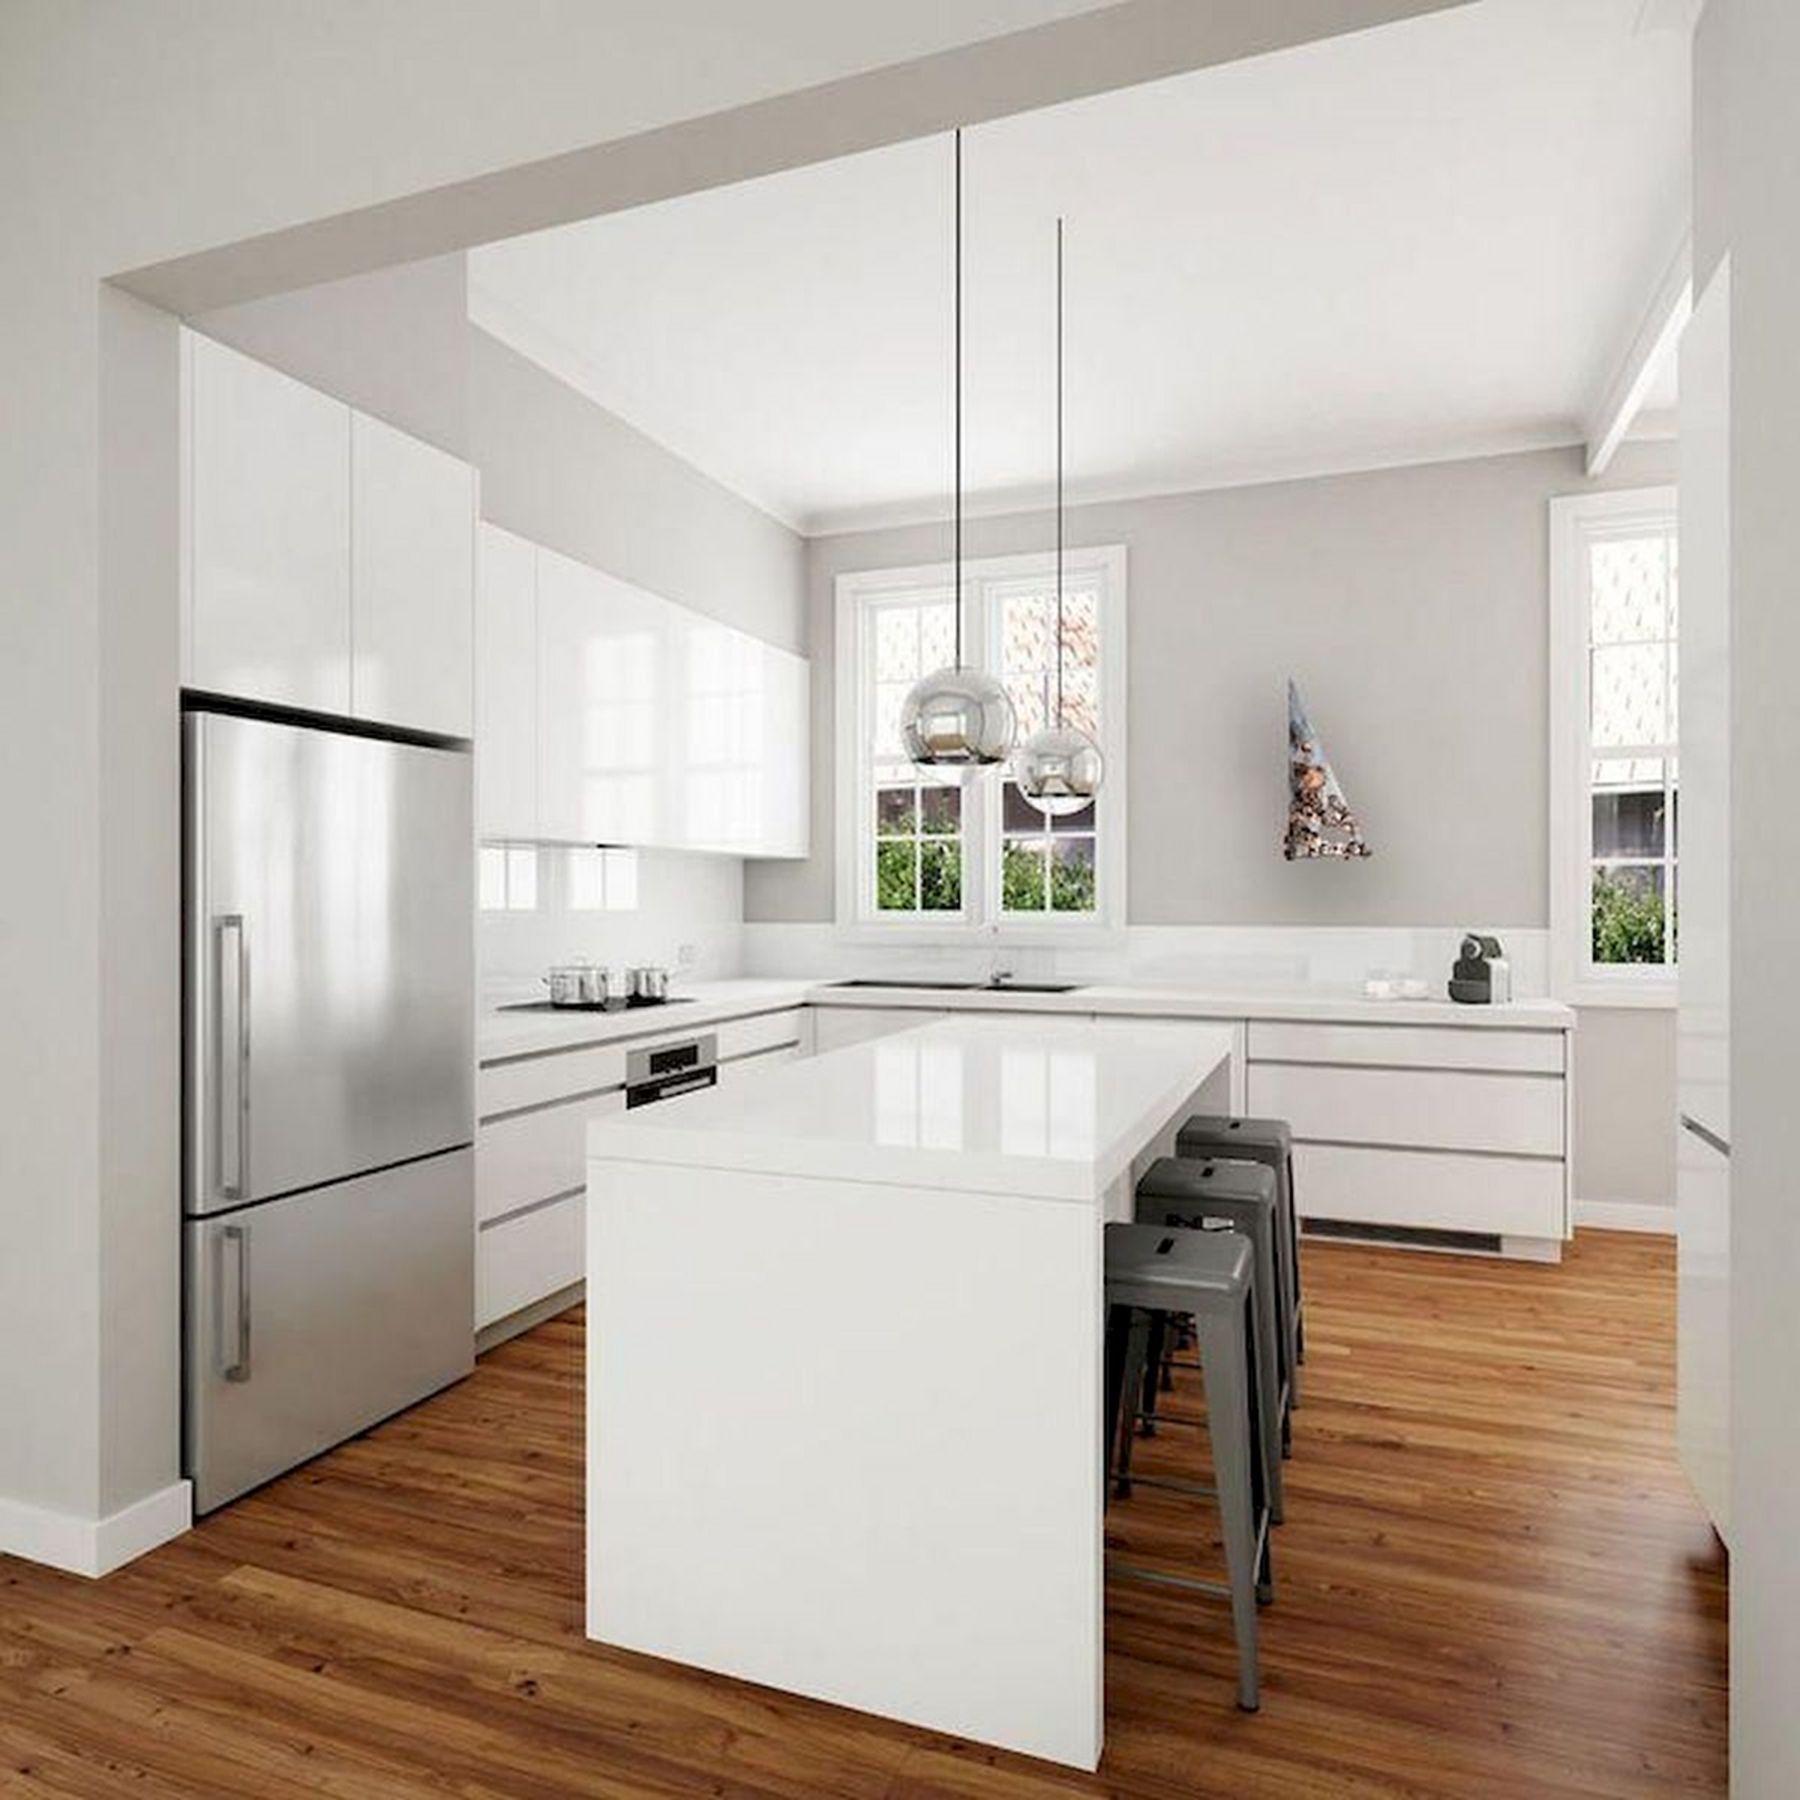 10 awesome kitchen design ideas for you apply to your minimalist home white modern kitchen on kitchen ideas minimalist id=61289